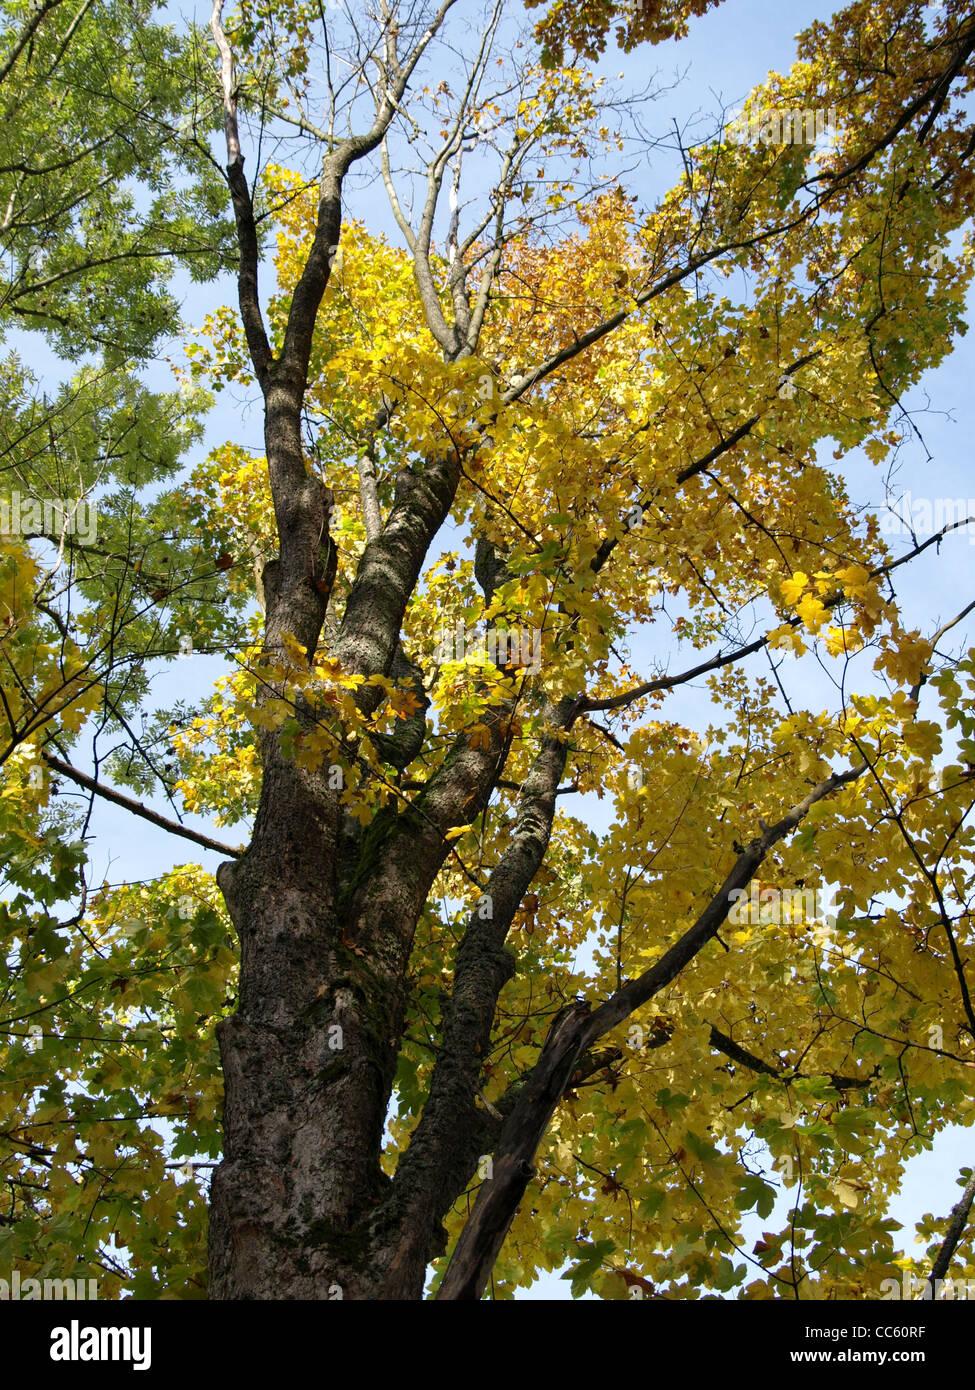 sycamore maple in autumn / Acer pseudoplatanus / Bergahorn im Herbst Stock Photo